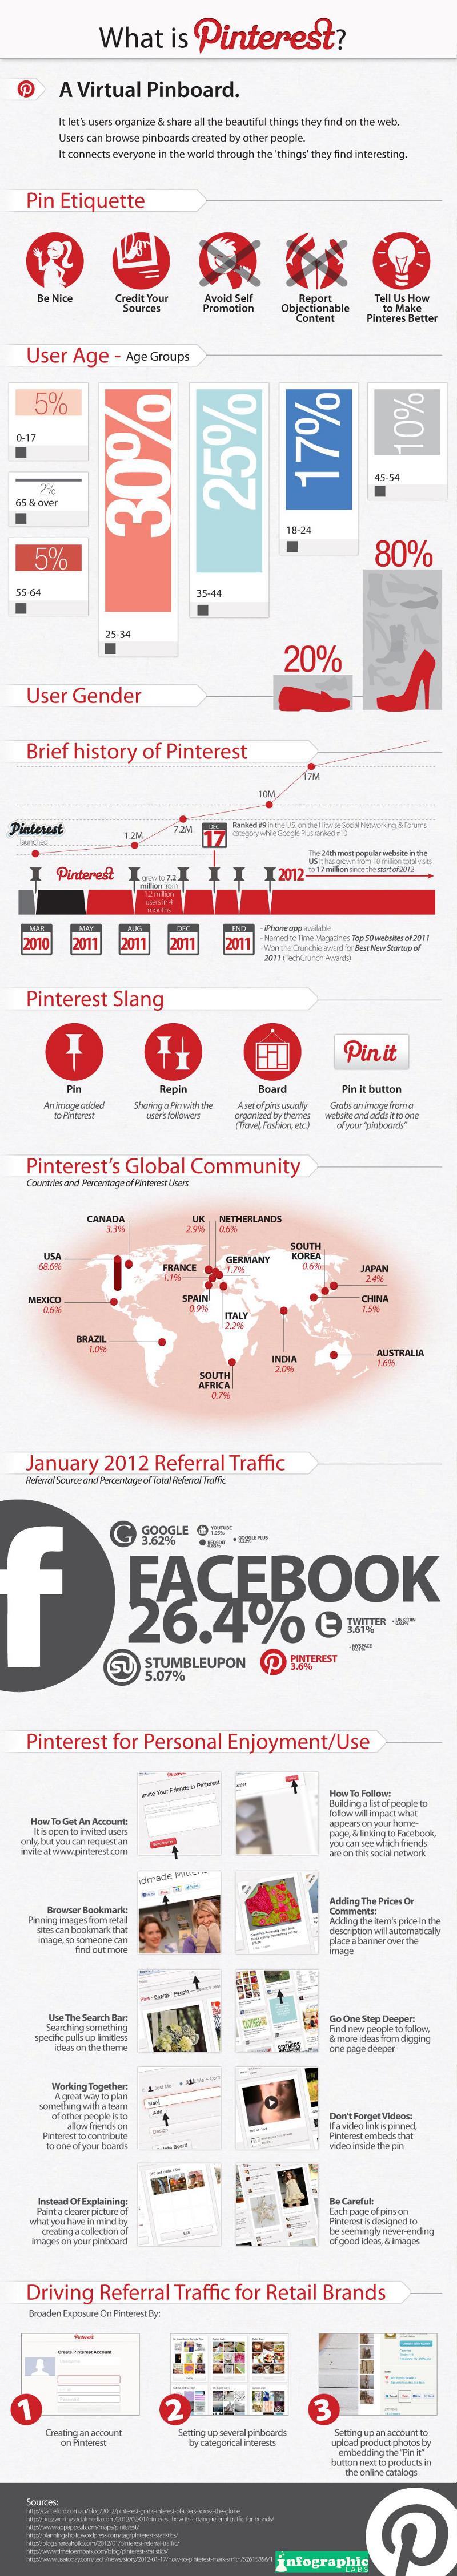 Pinterest User Age Demographics